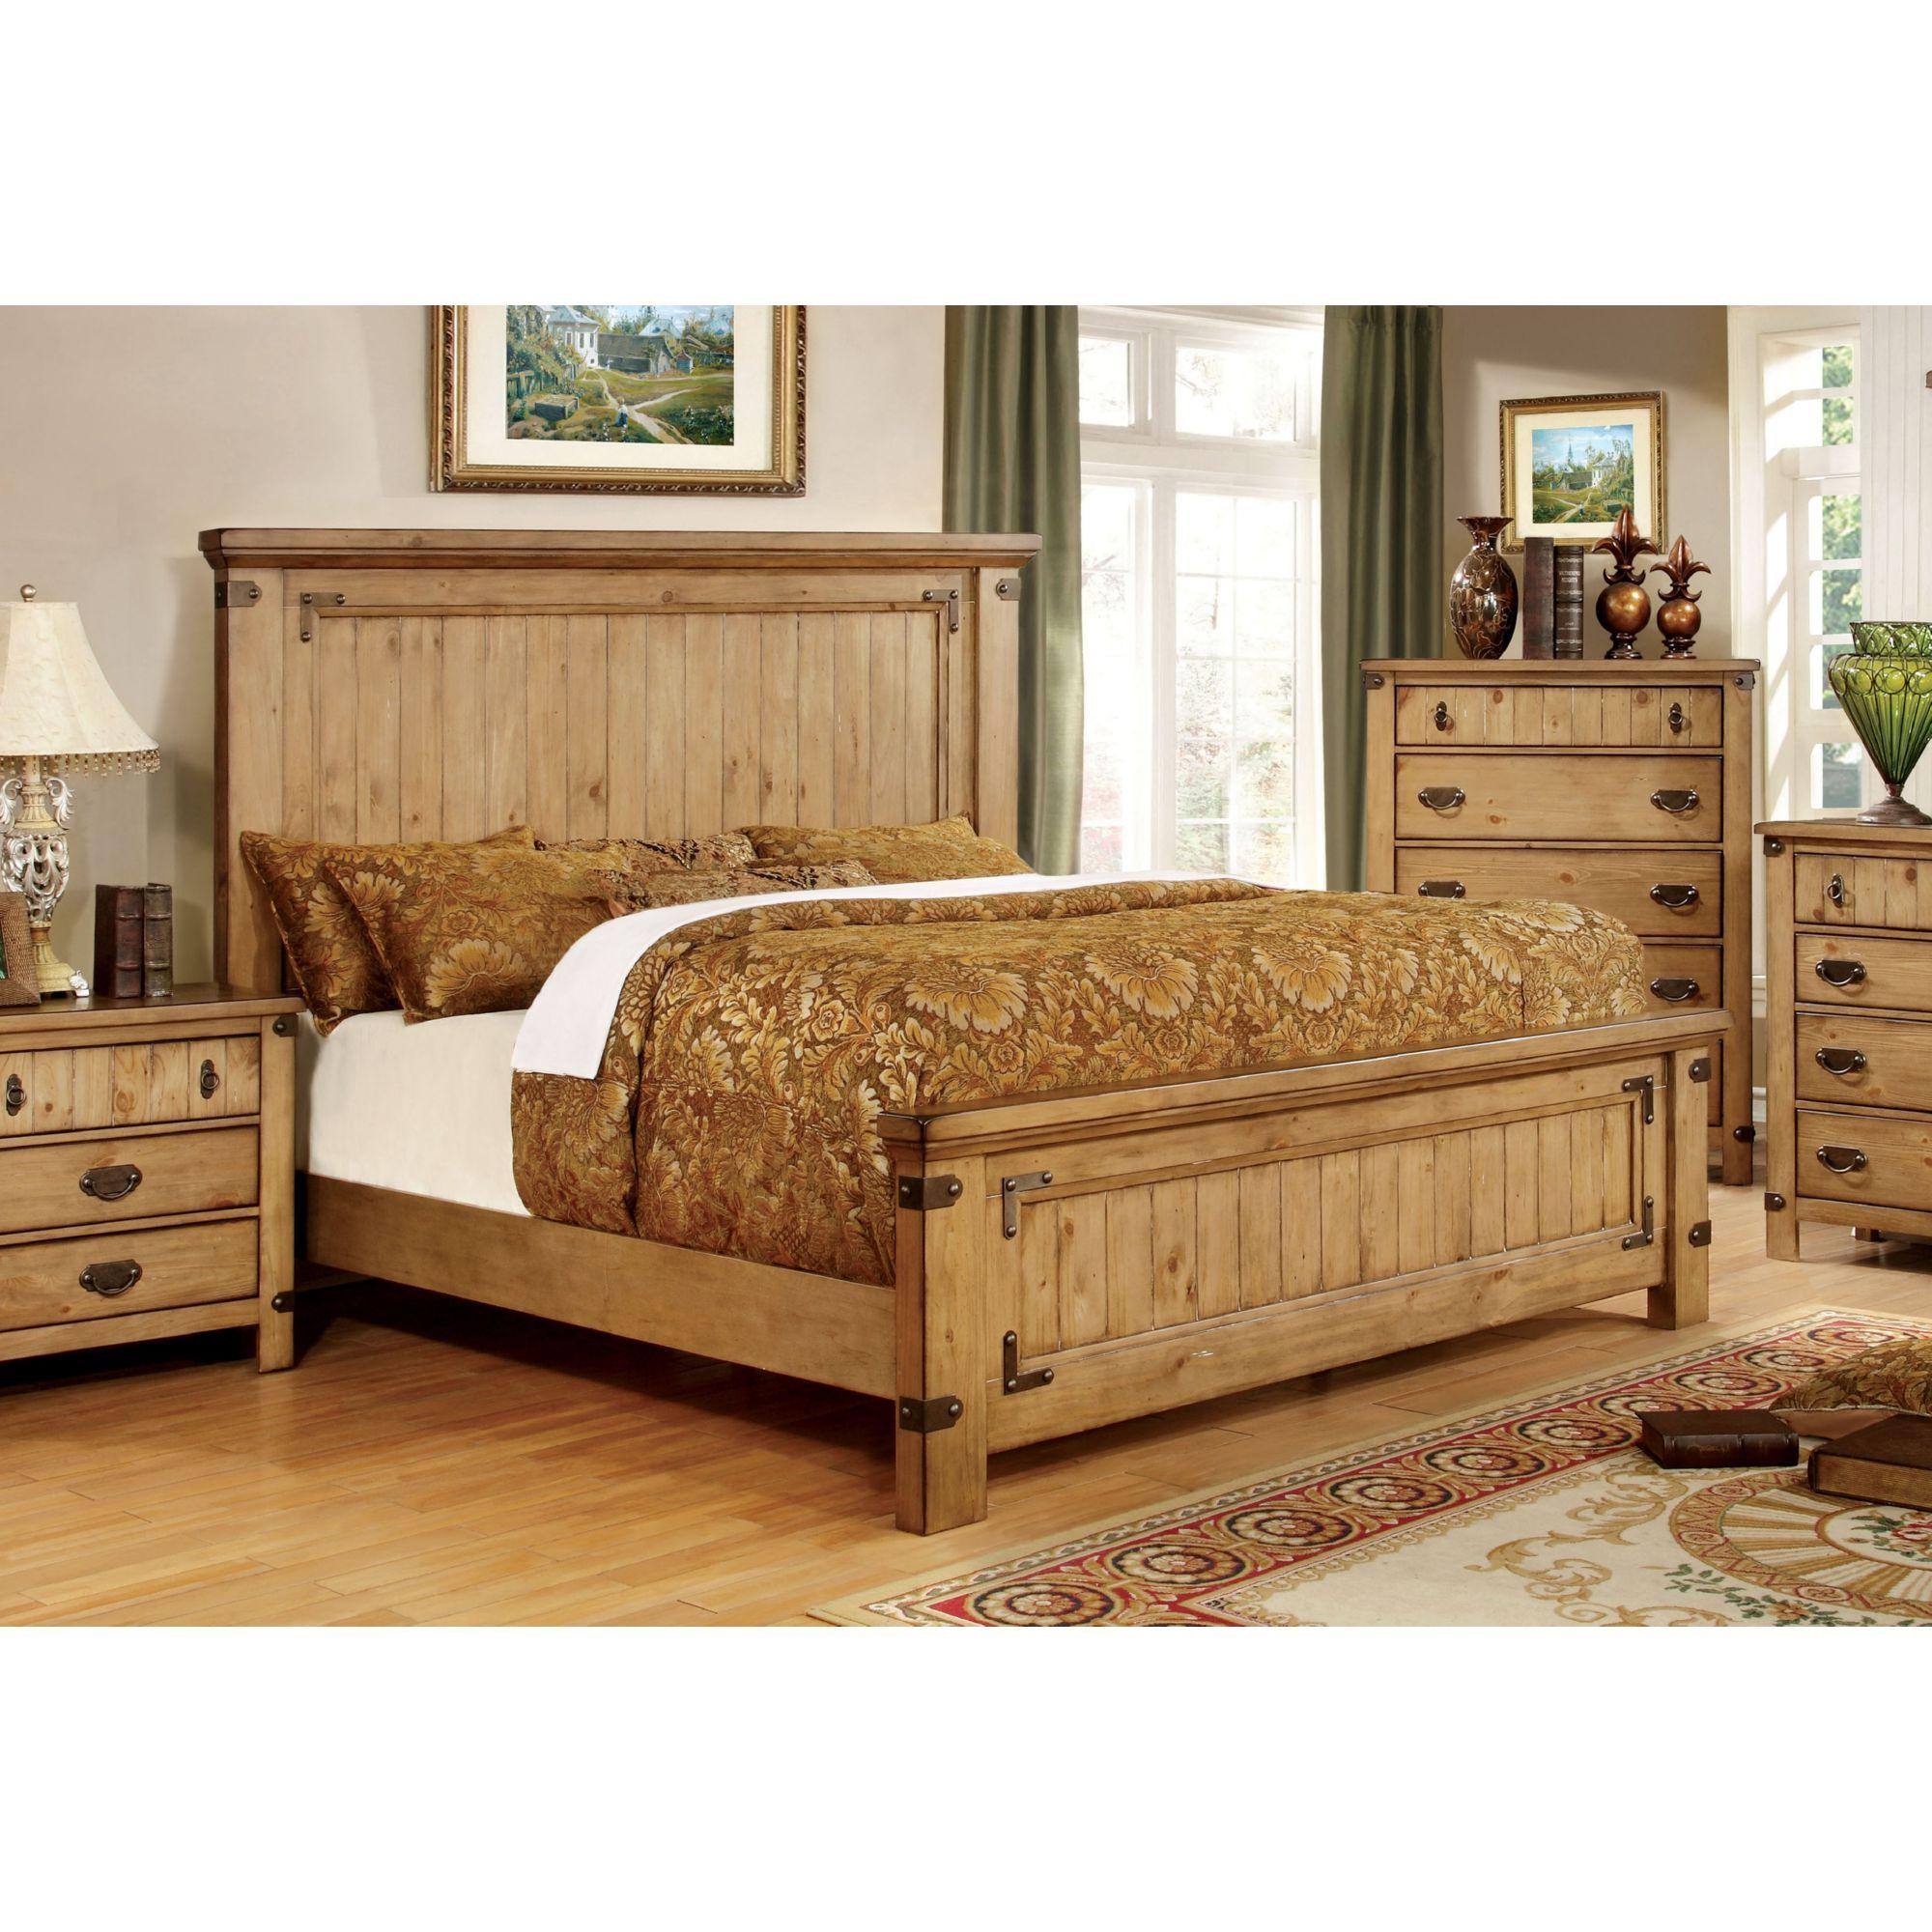 Furniture of America Rockwell Rustic Wood Accent Platform